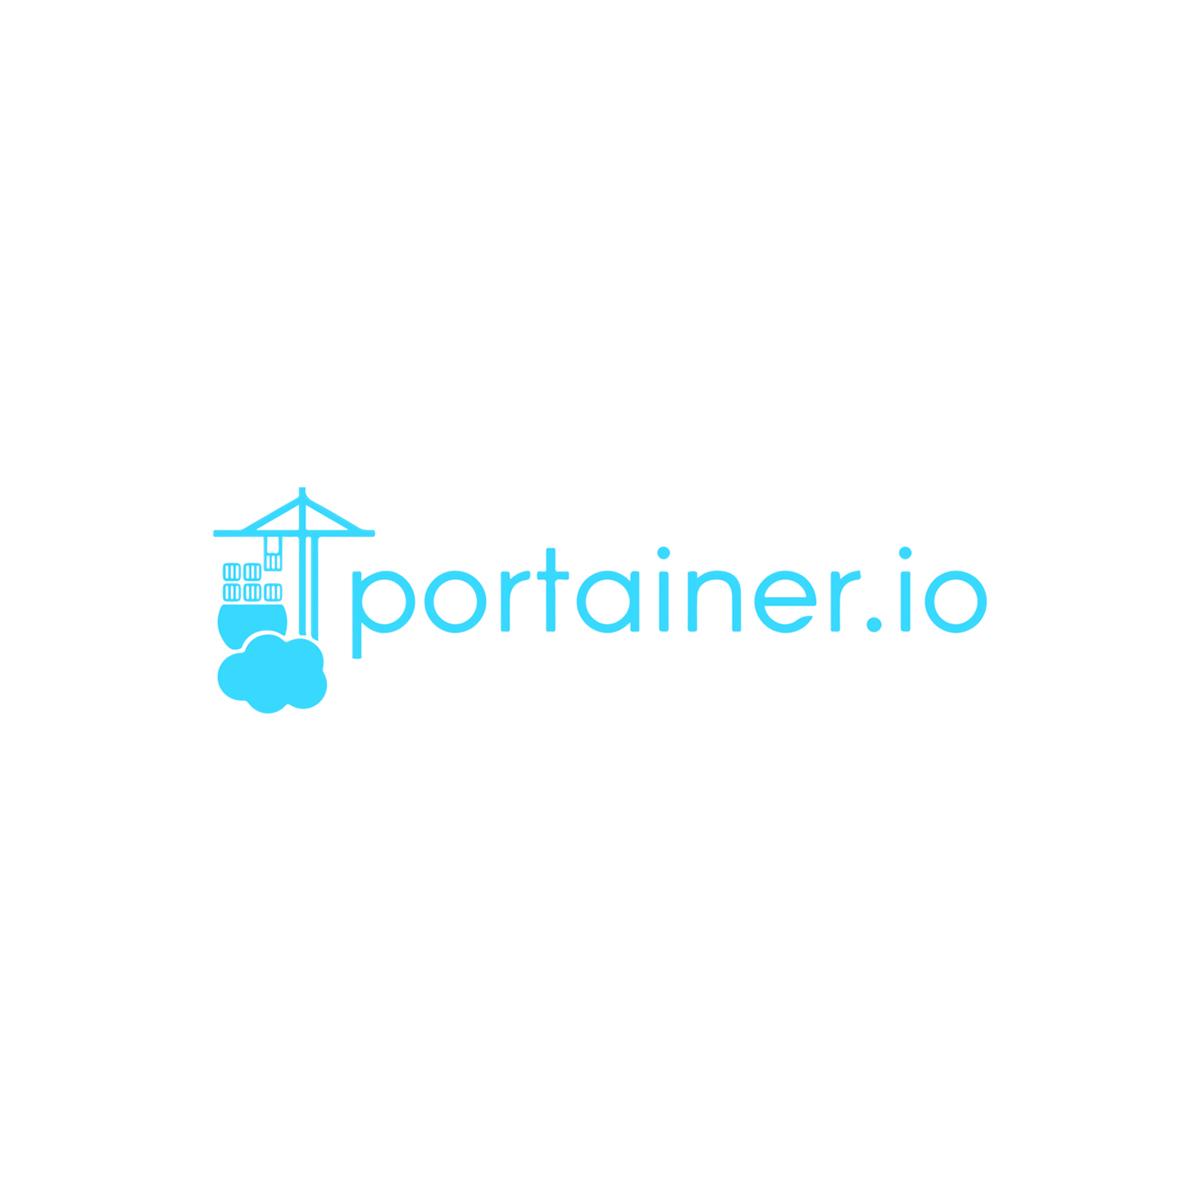 Portainer